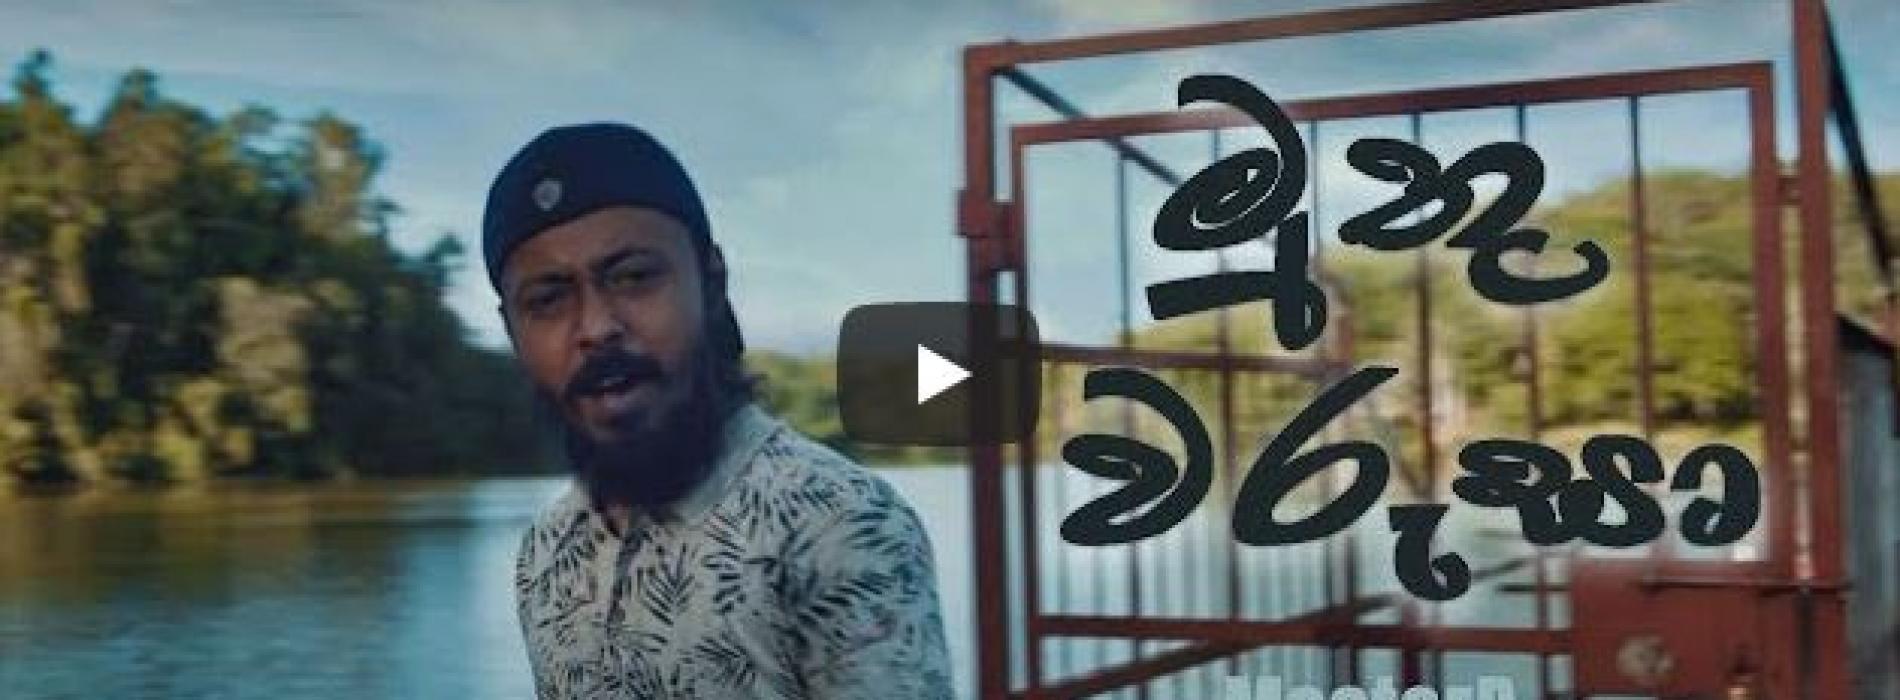 New Music : MasterD – Muthu Warusa (මුතු වරුසා) Official Music Video